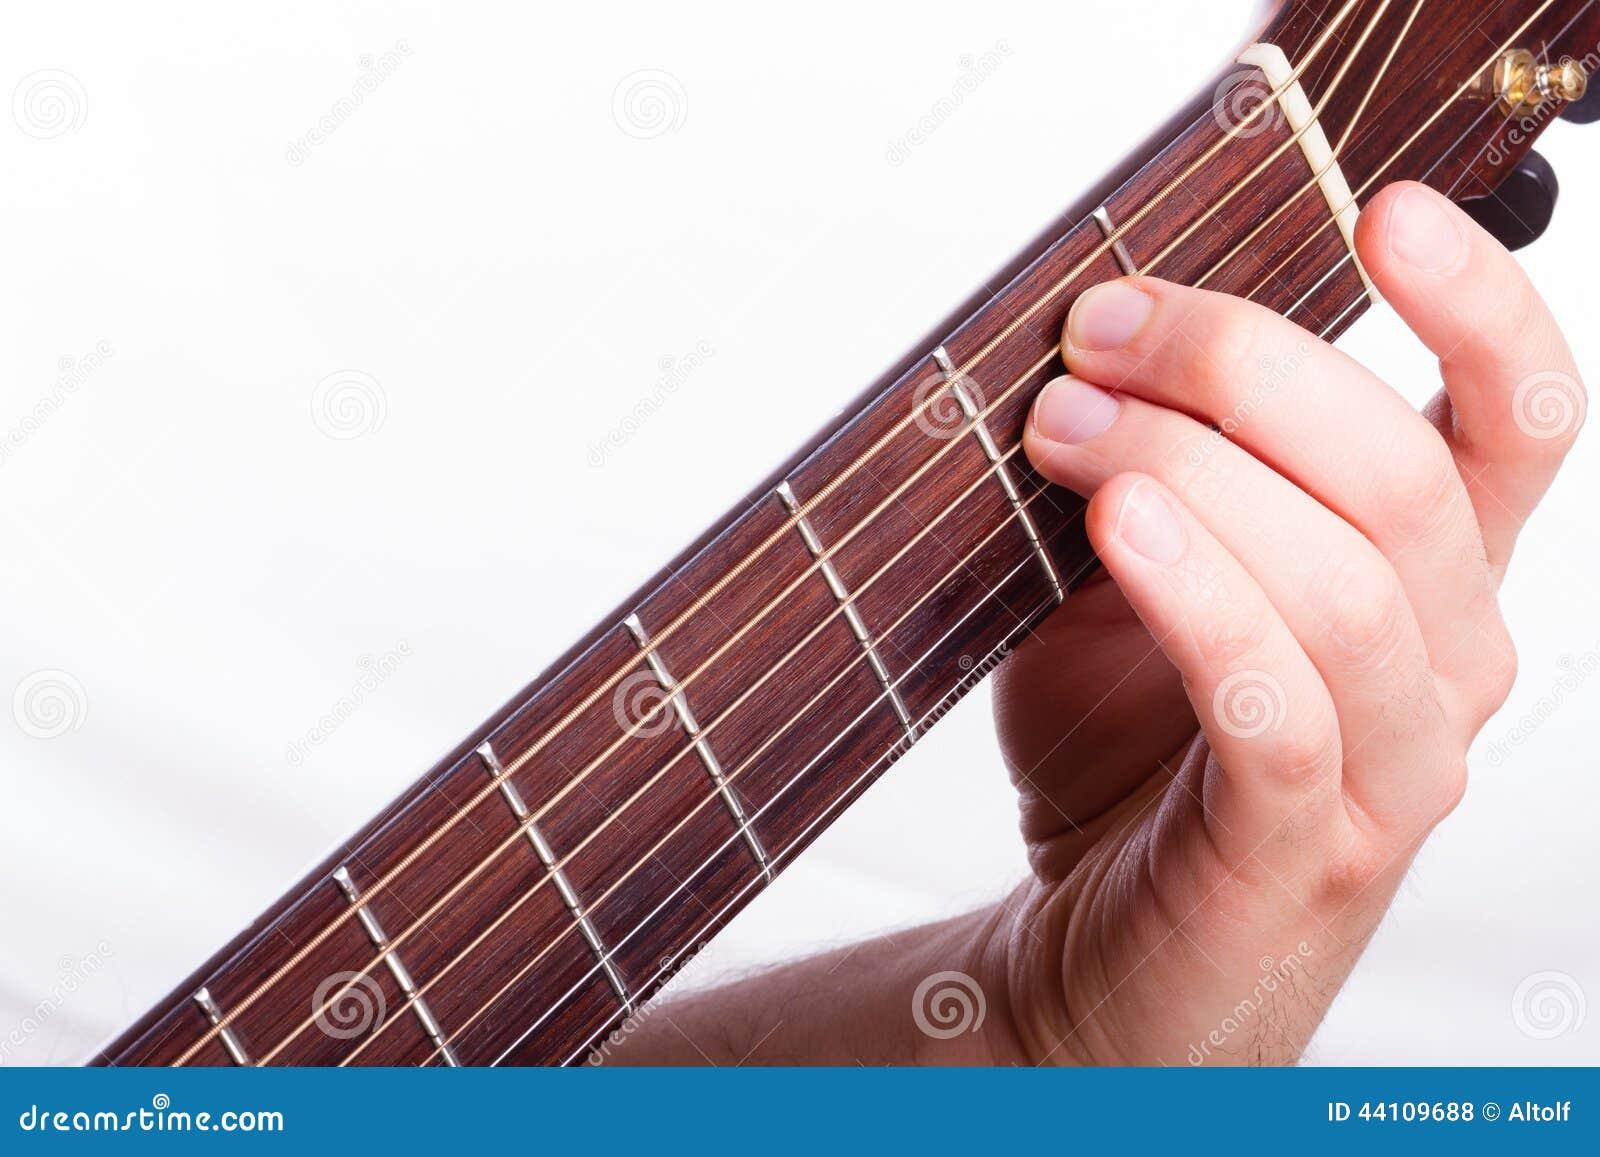 E Minor Chord Stock Photo Image Of Human Body Fingers 44109688